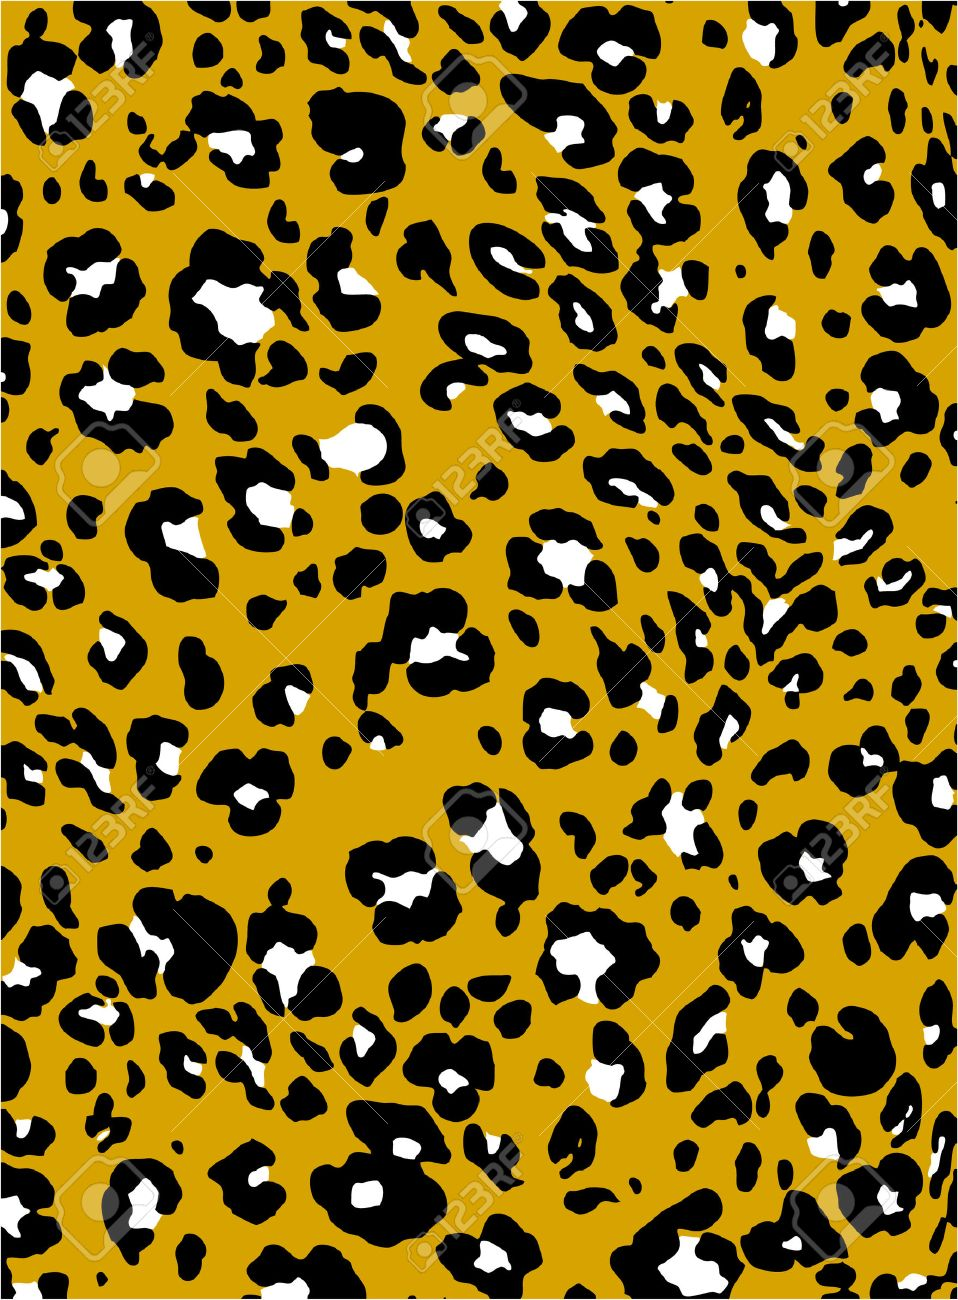 abstract animal print backdrop pattern Stock Vector - 8340159